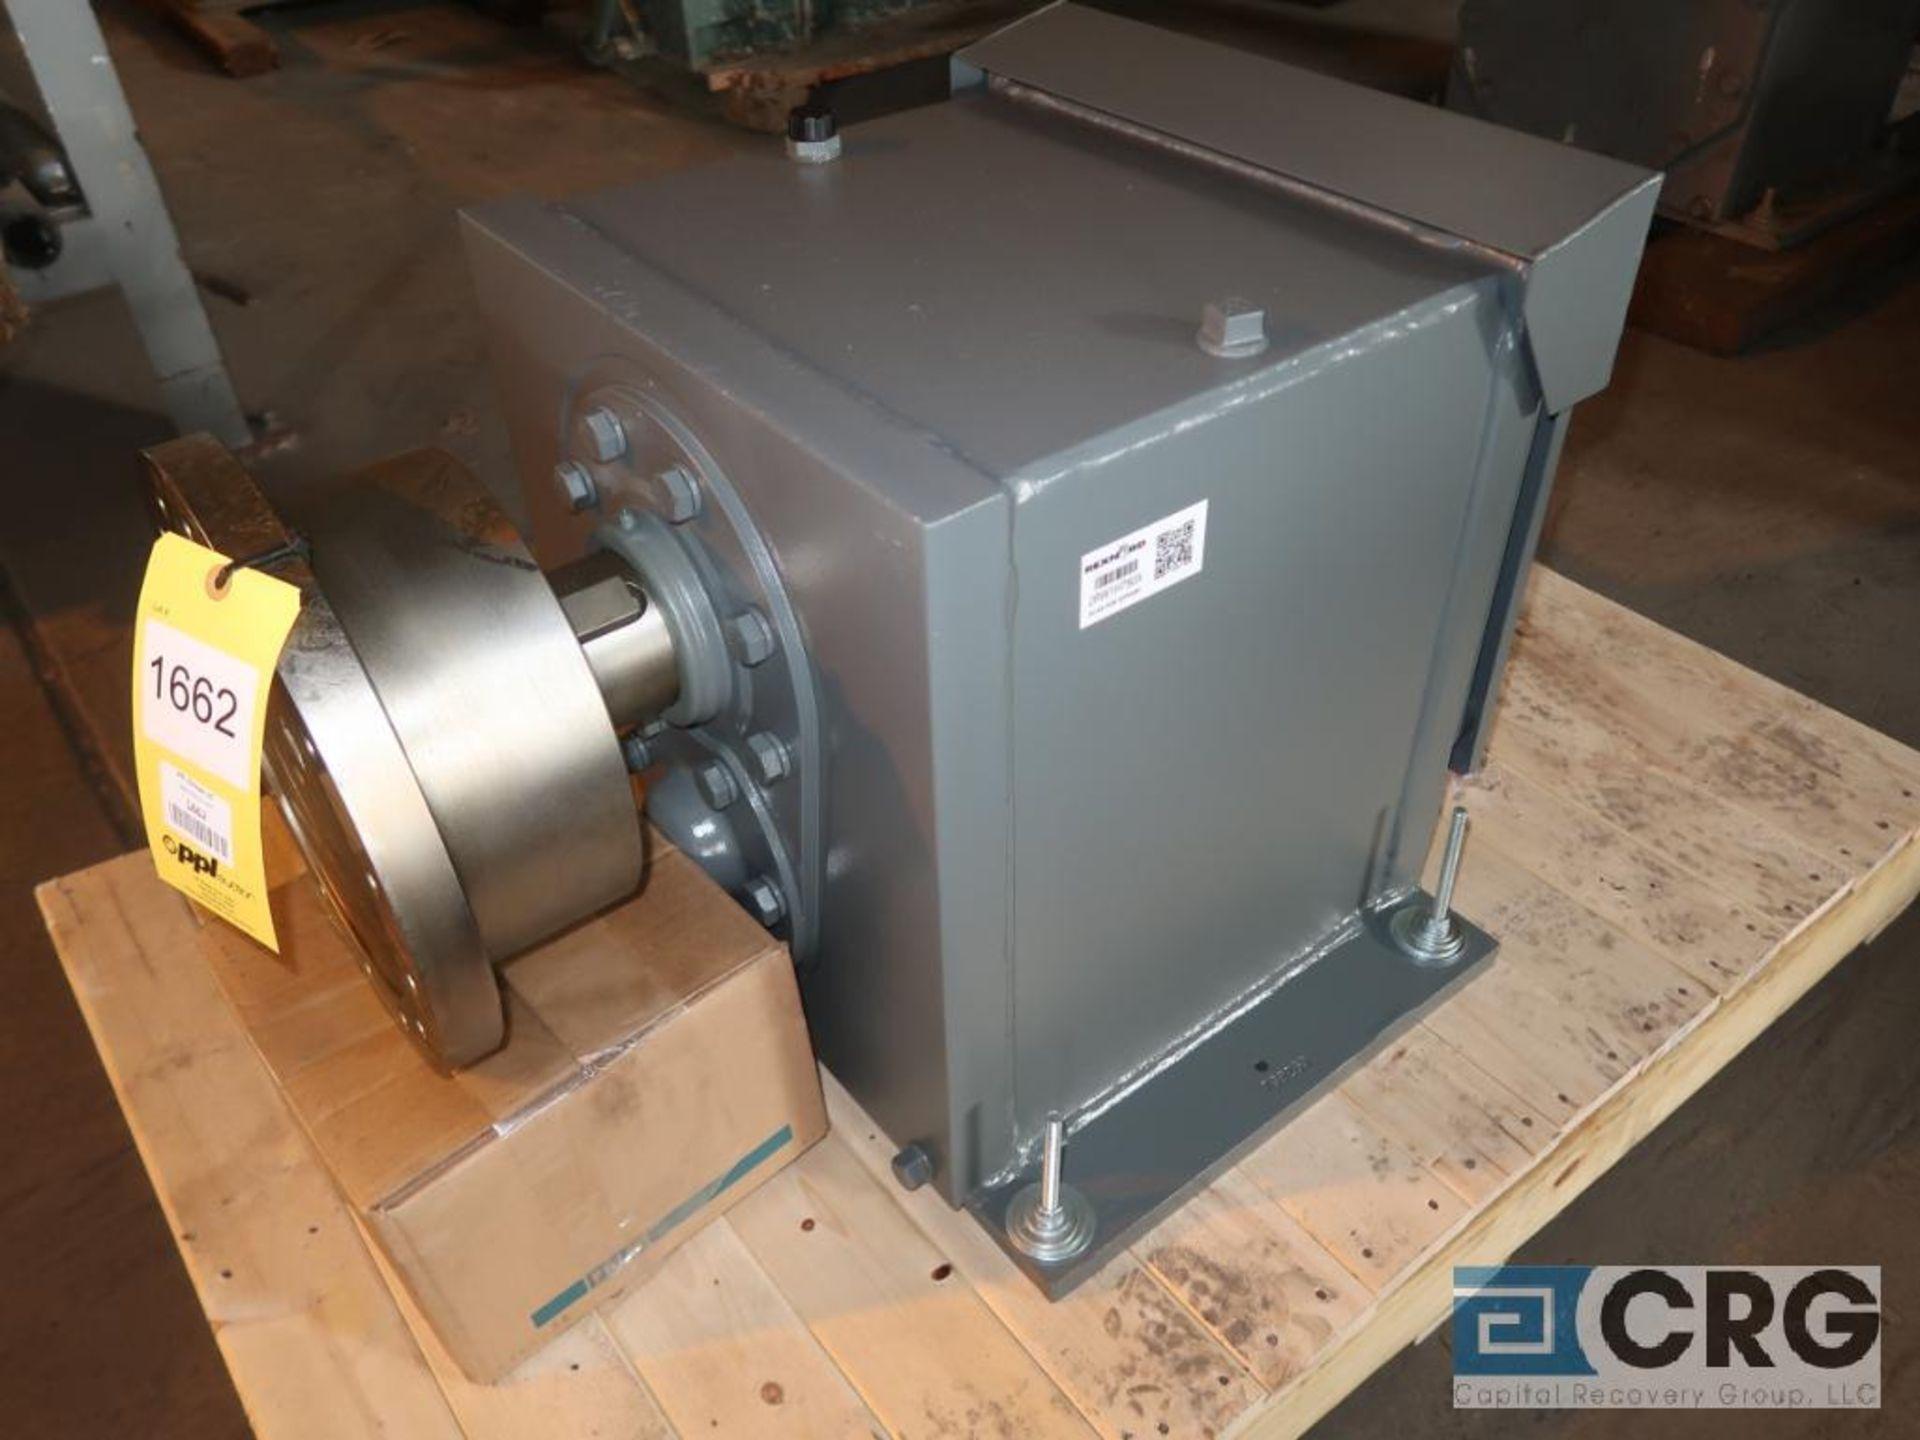 Falk 1080FC2AB gear drive, ratio-7.779, input RPM 1,917, output RPM 246, service rate HP. 100, s/n